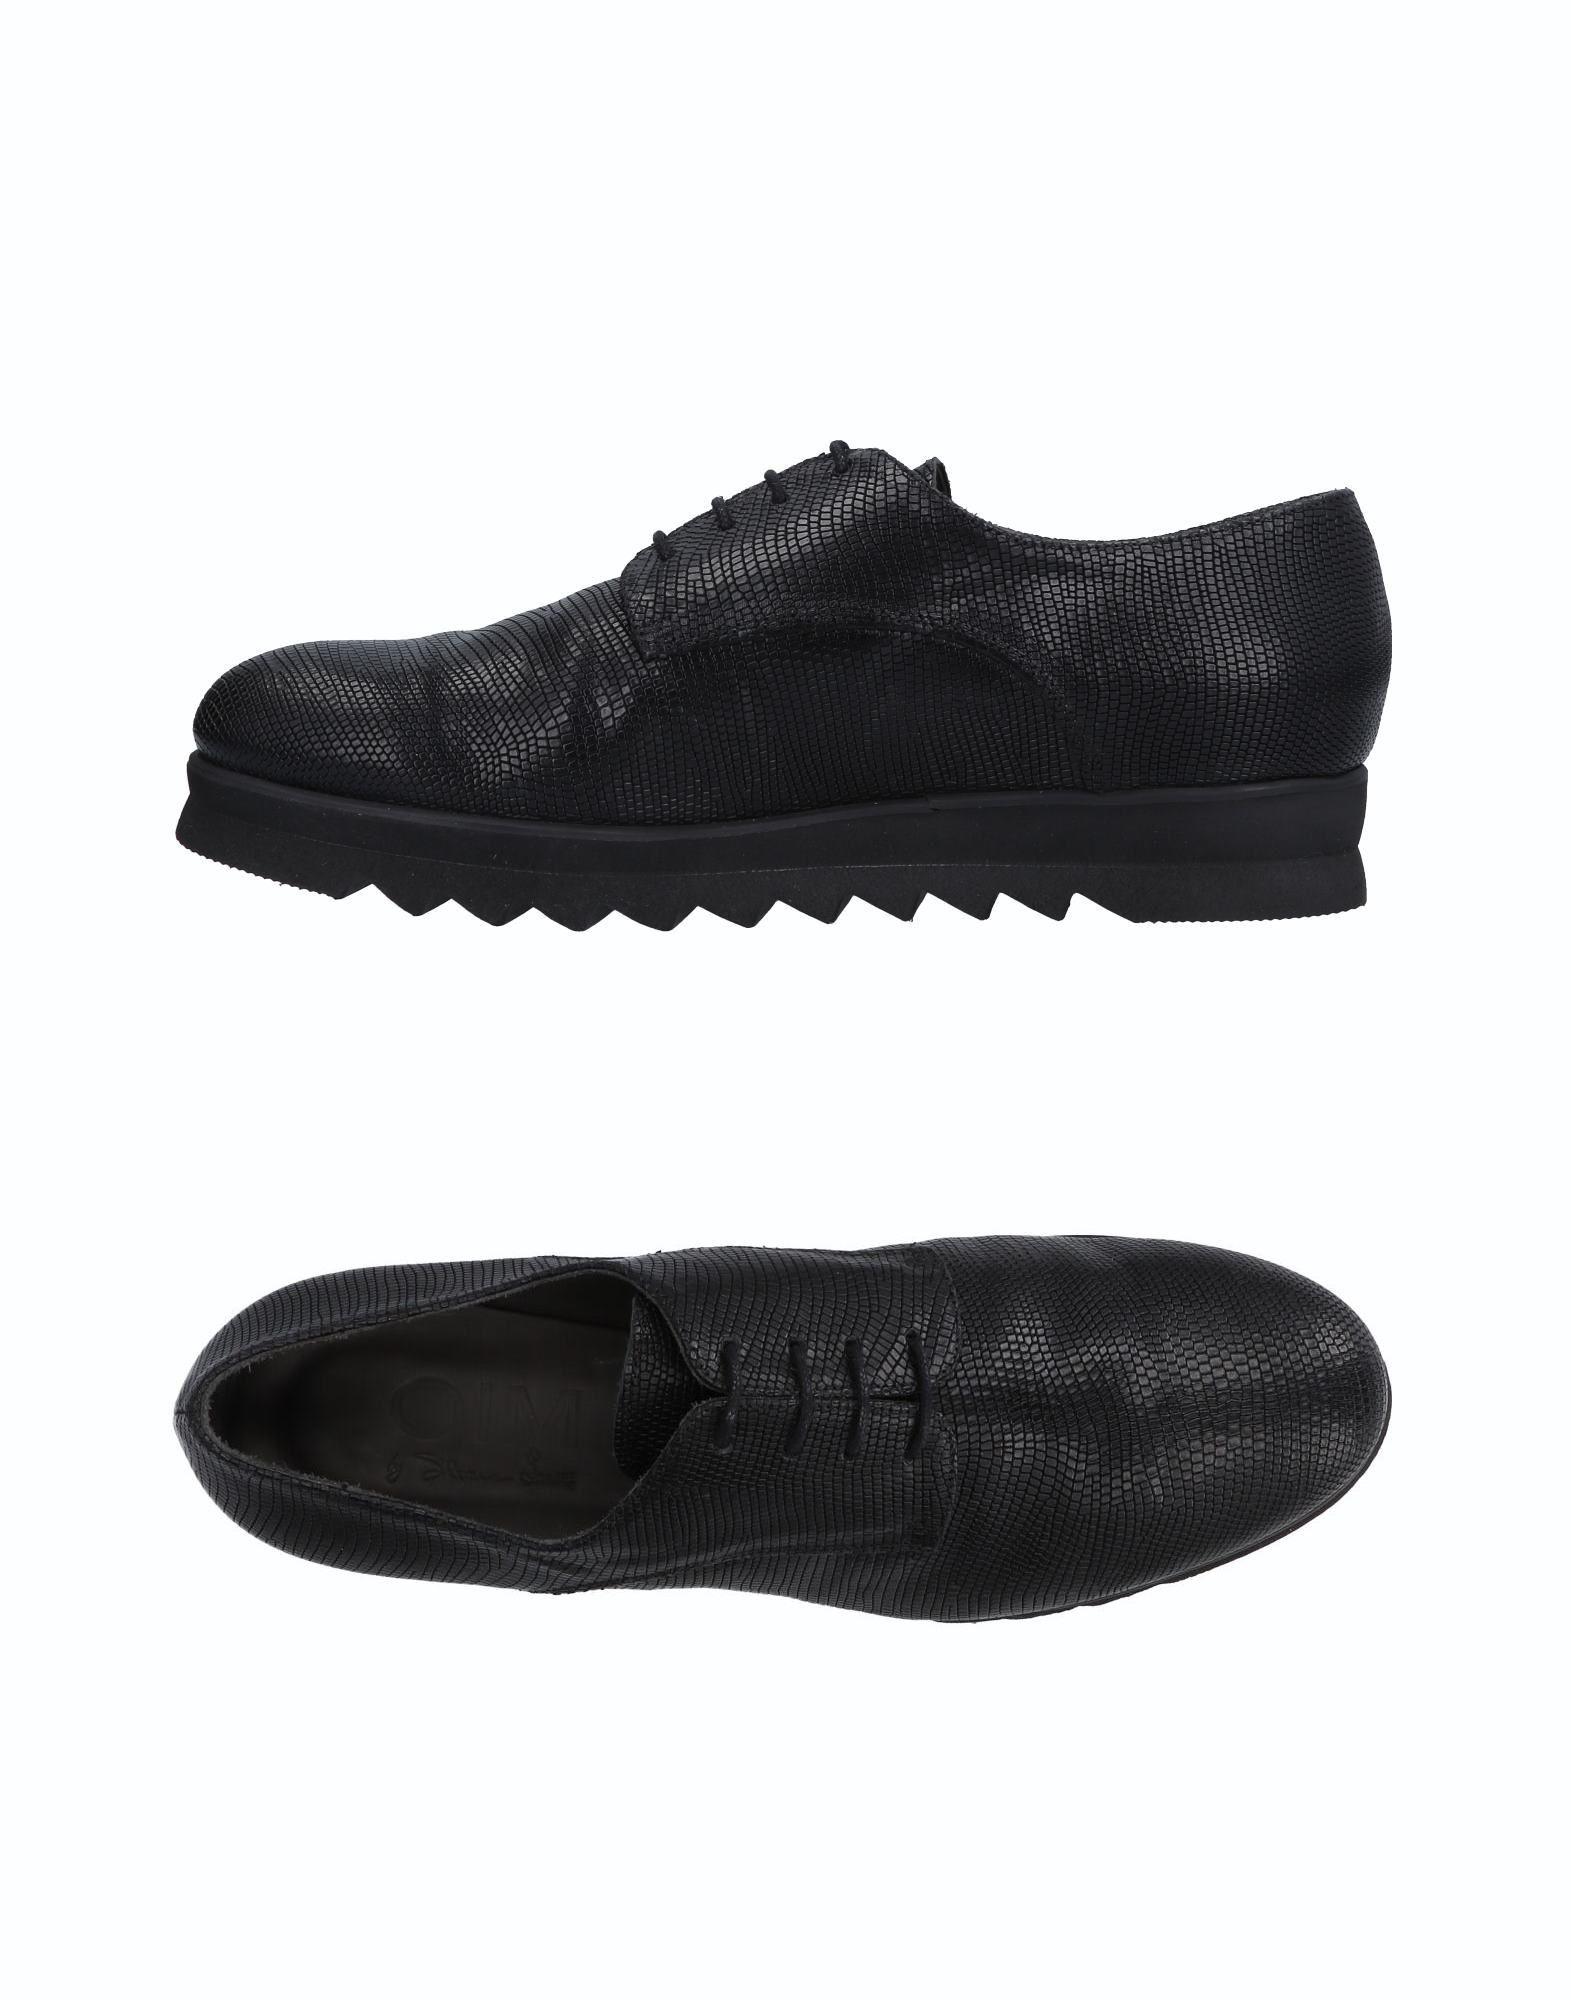 Oim By Silvana Lauri Schnürschuhe Damen  11501569QC Gute Qualität beliebte Schuhe